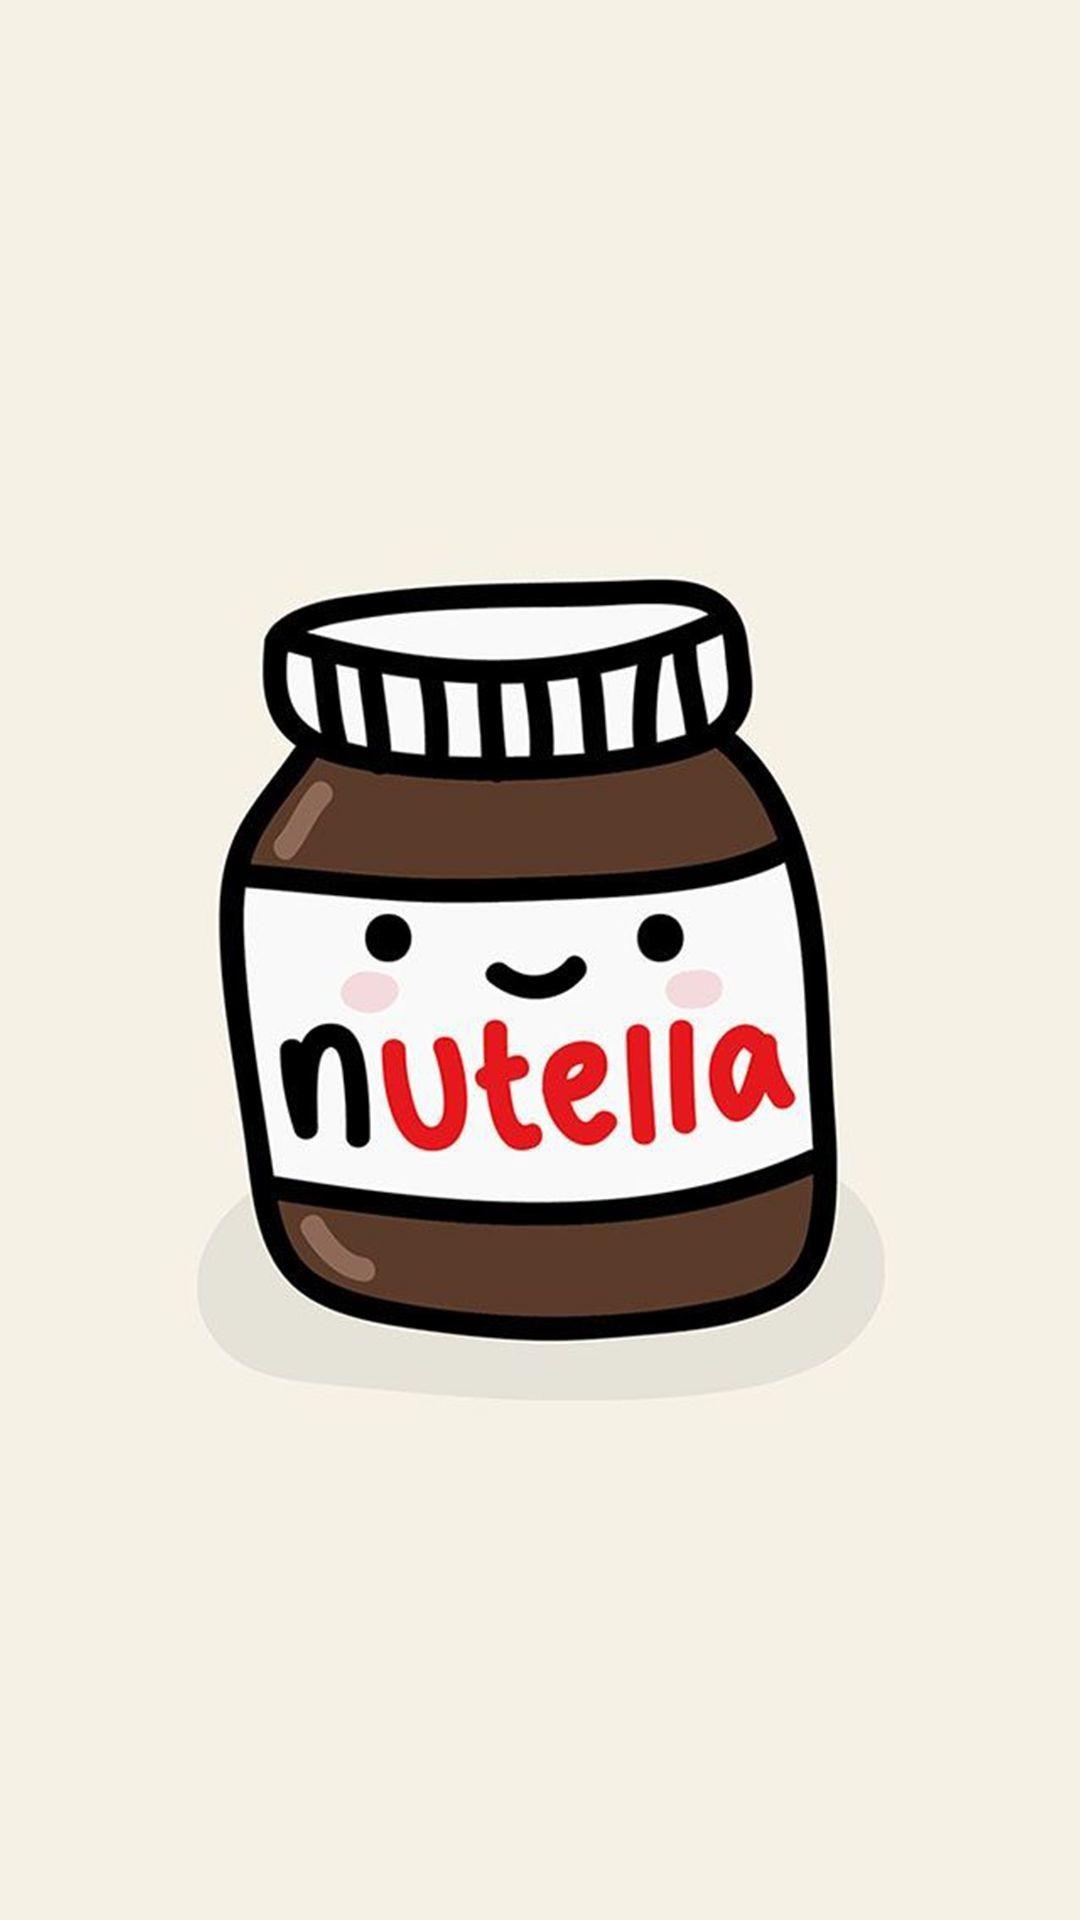 Res: 1080x1920, Cute Nutella Jar Illustration iPhone 6+ HD Wallpaper